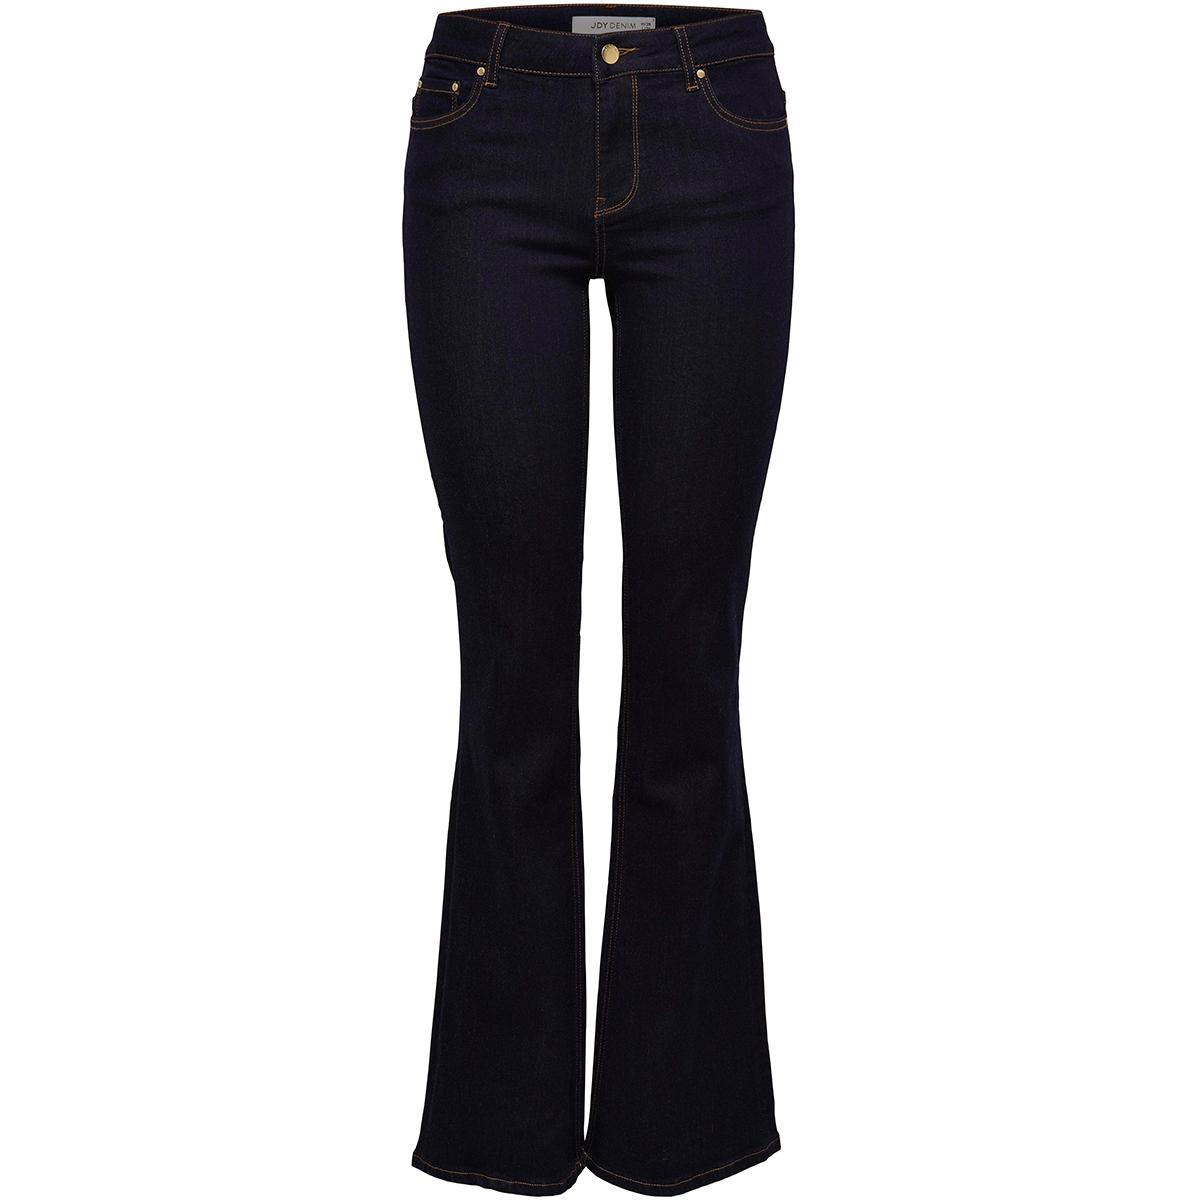 jdyelia flared rw dnm noos 15159254 jacqueline de yong jeans dark blue denim